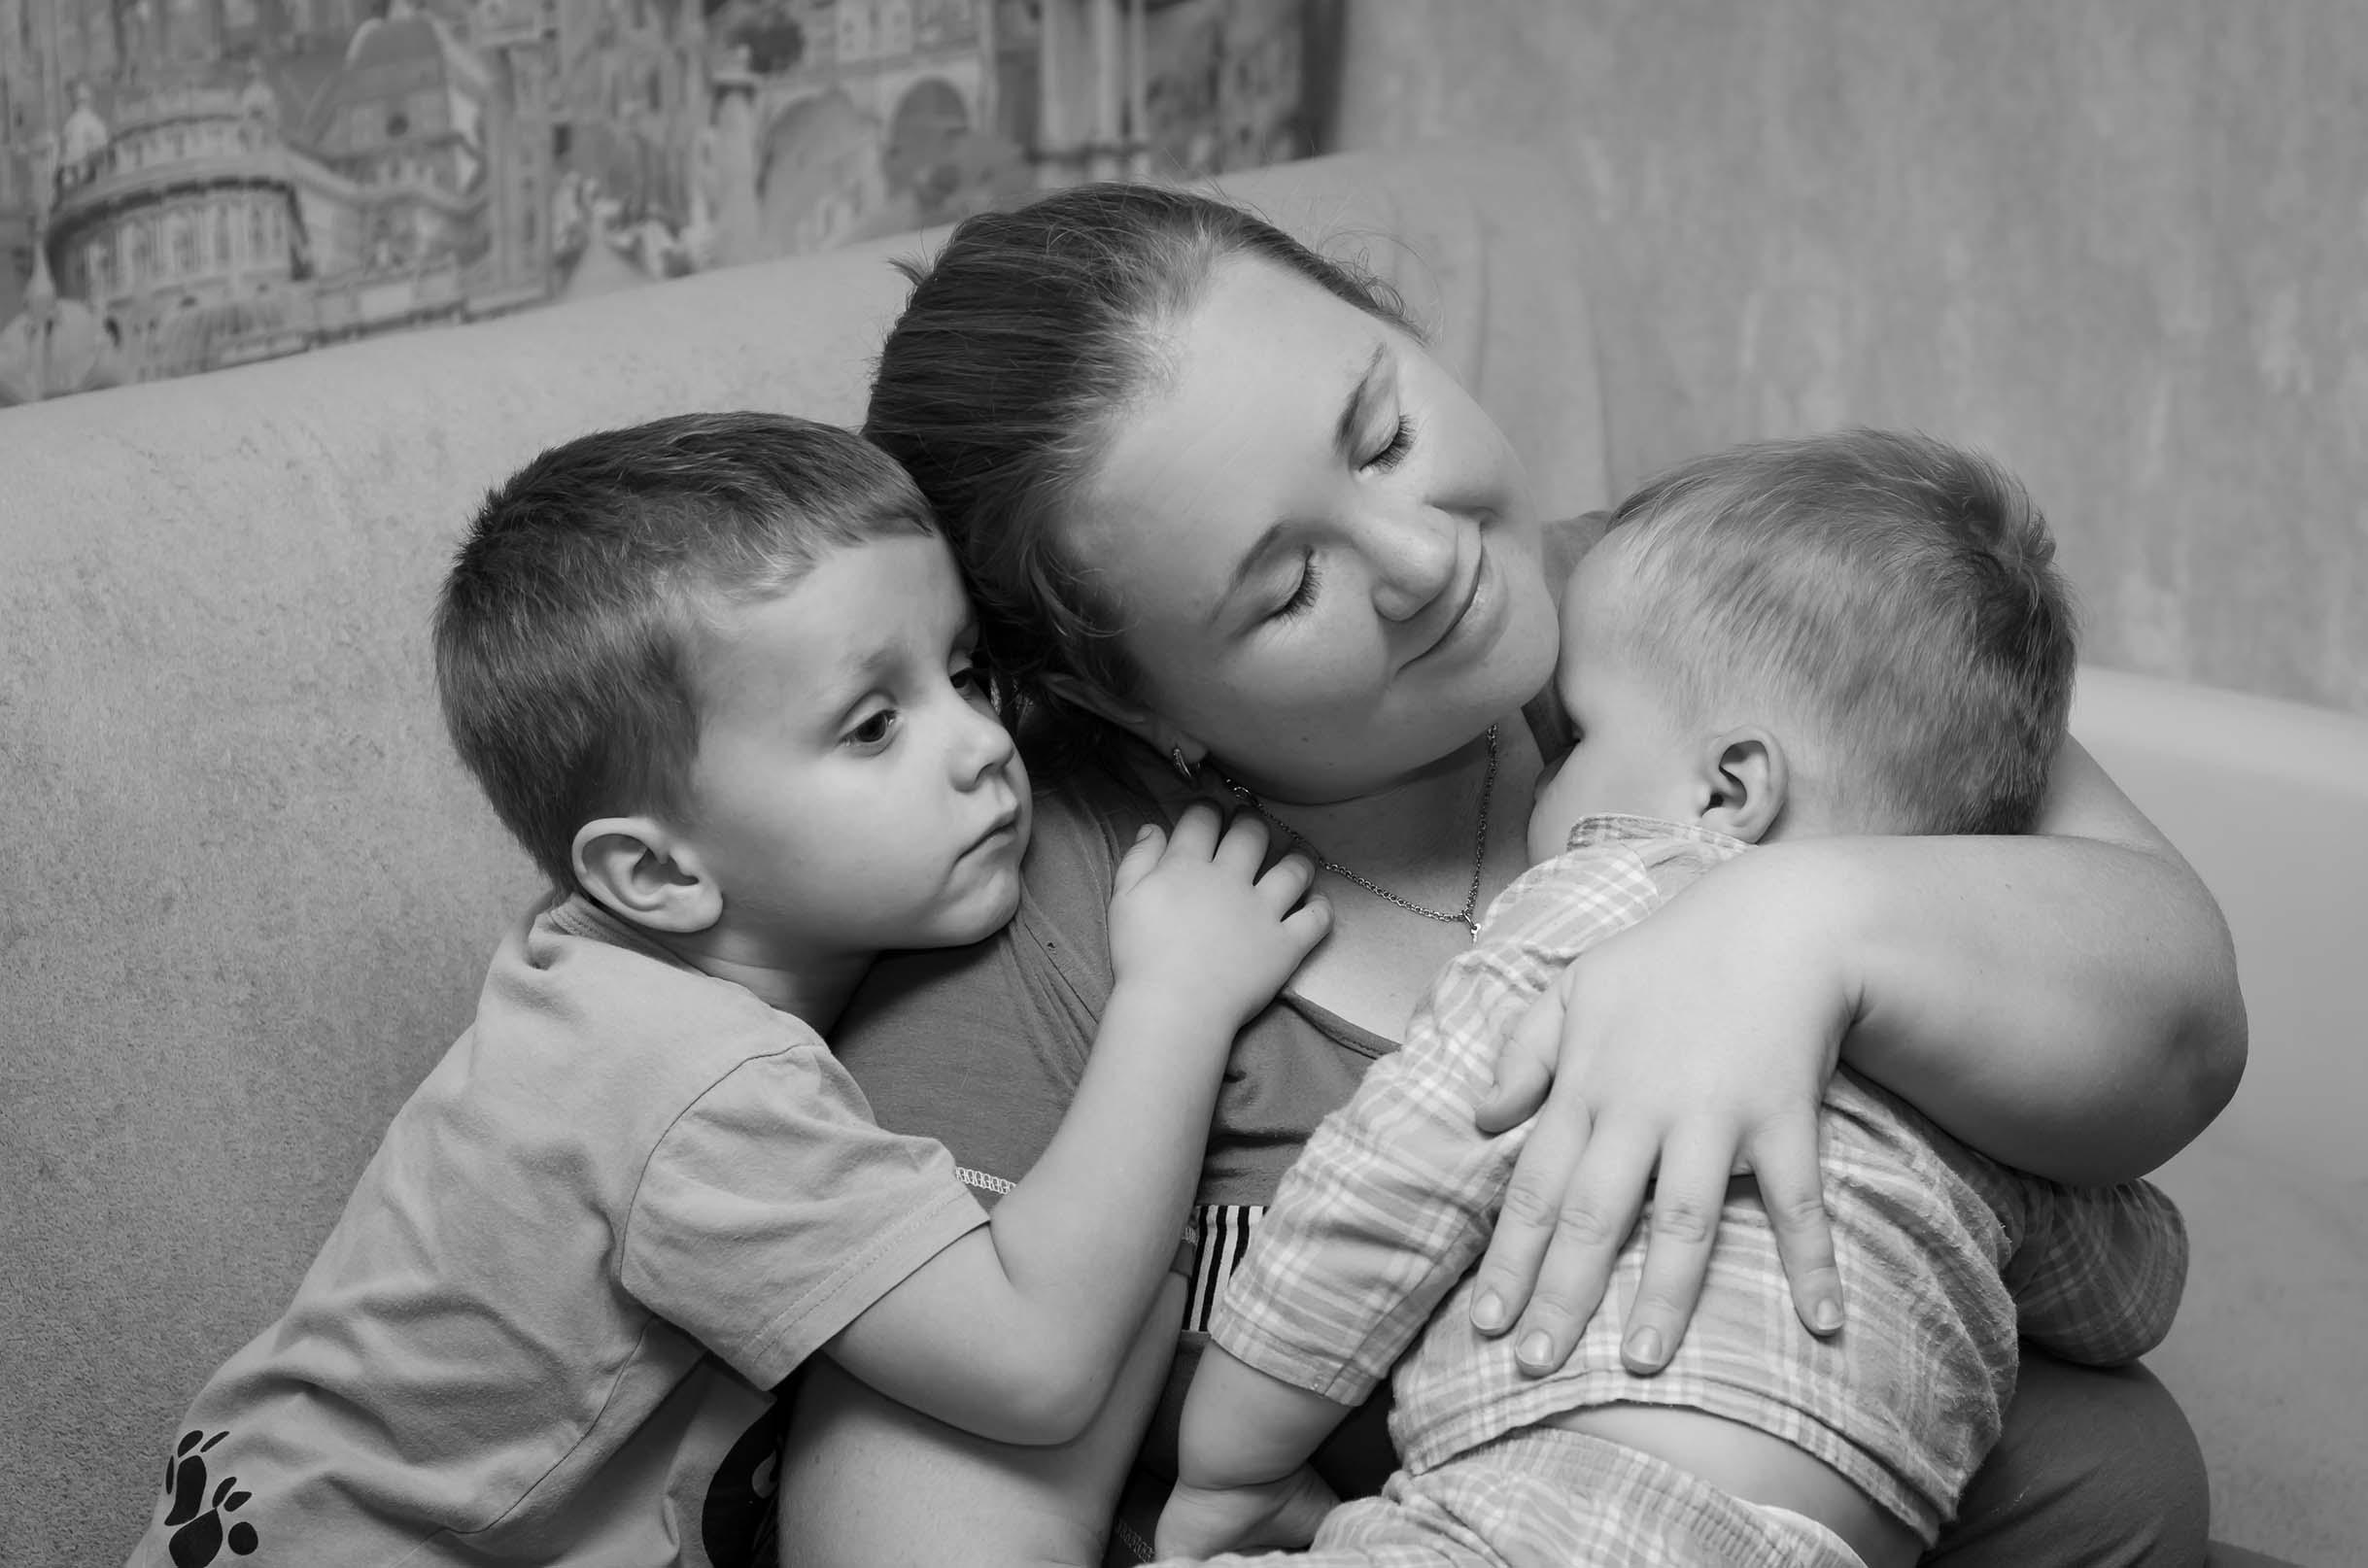 Член сына в матери фото 18 фотография